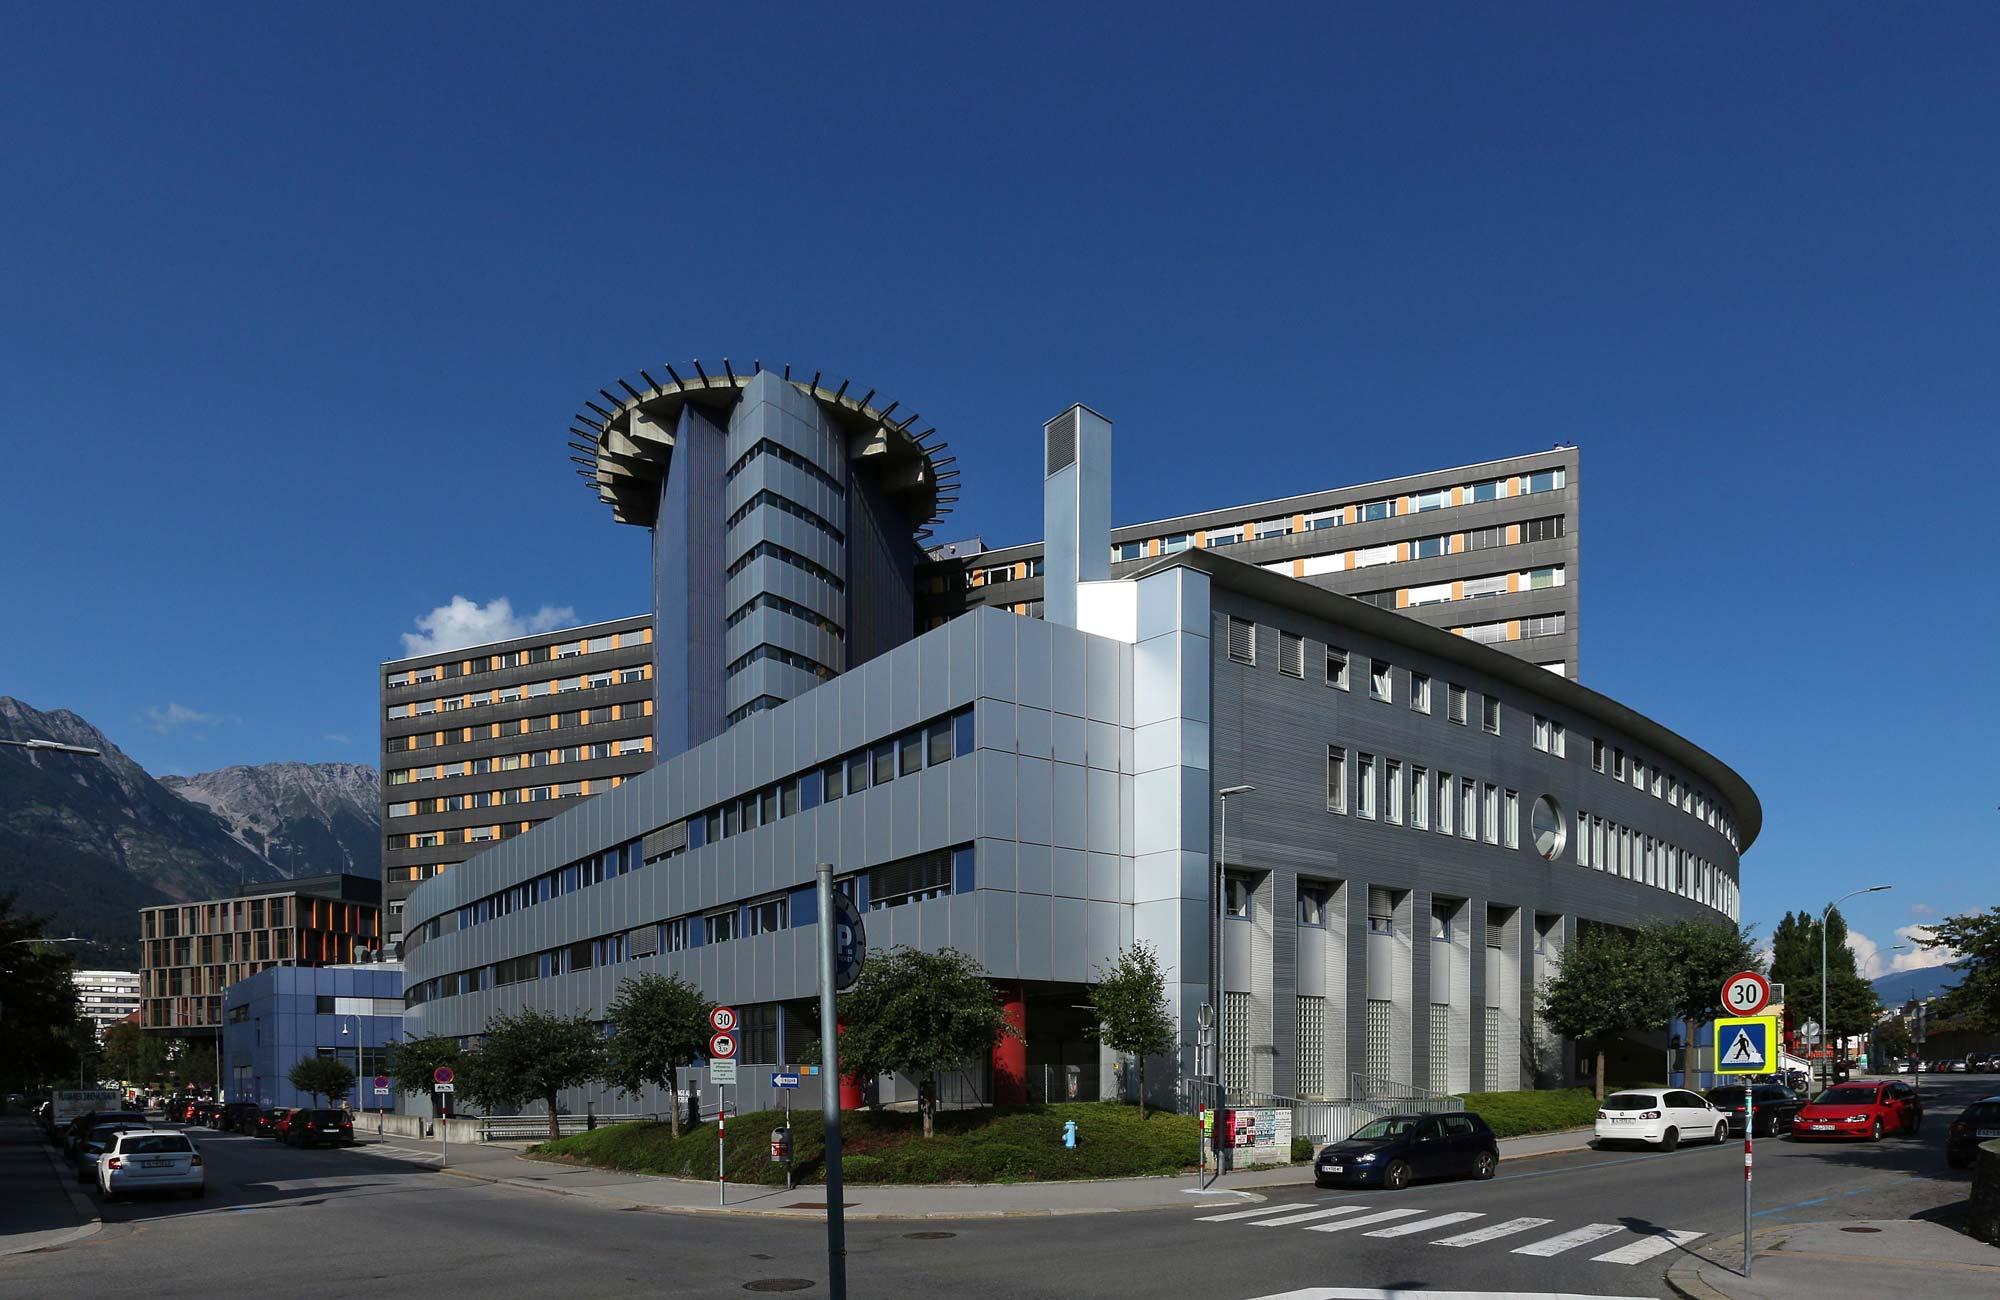 Hospital Innsbruck